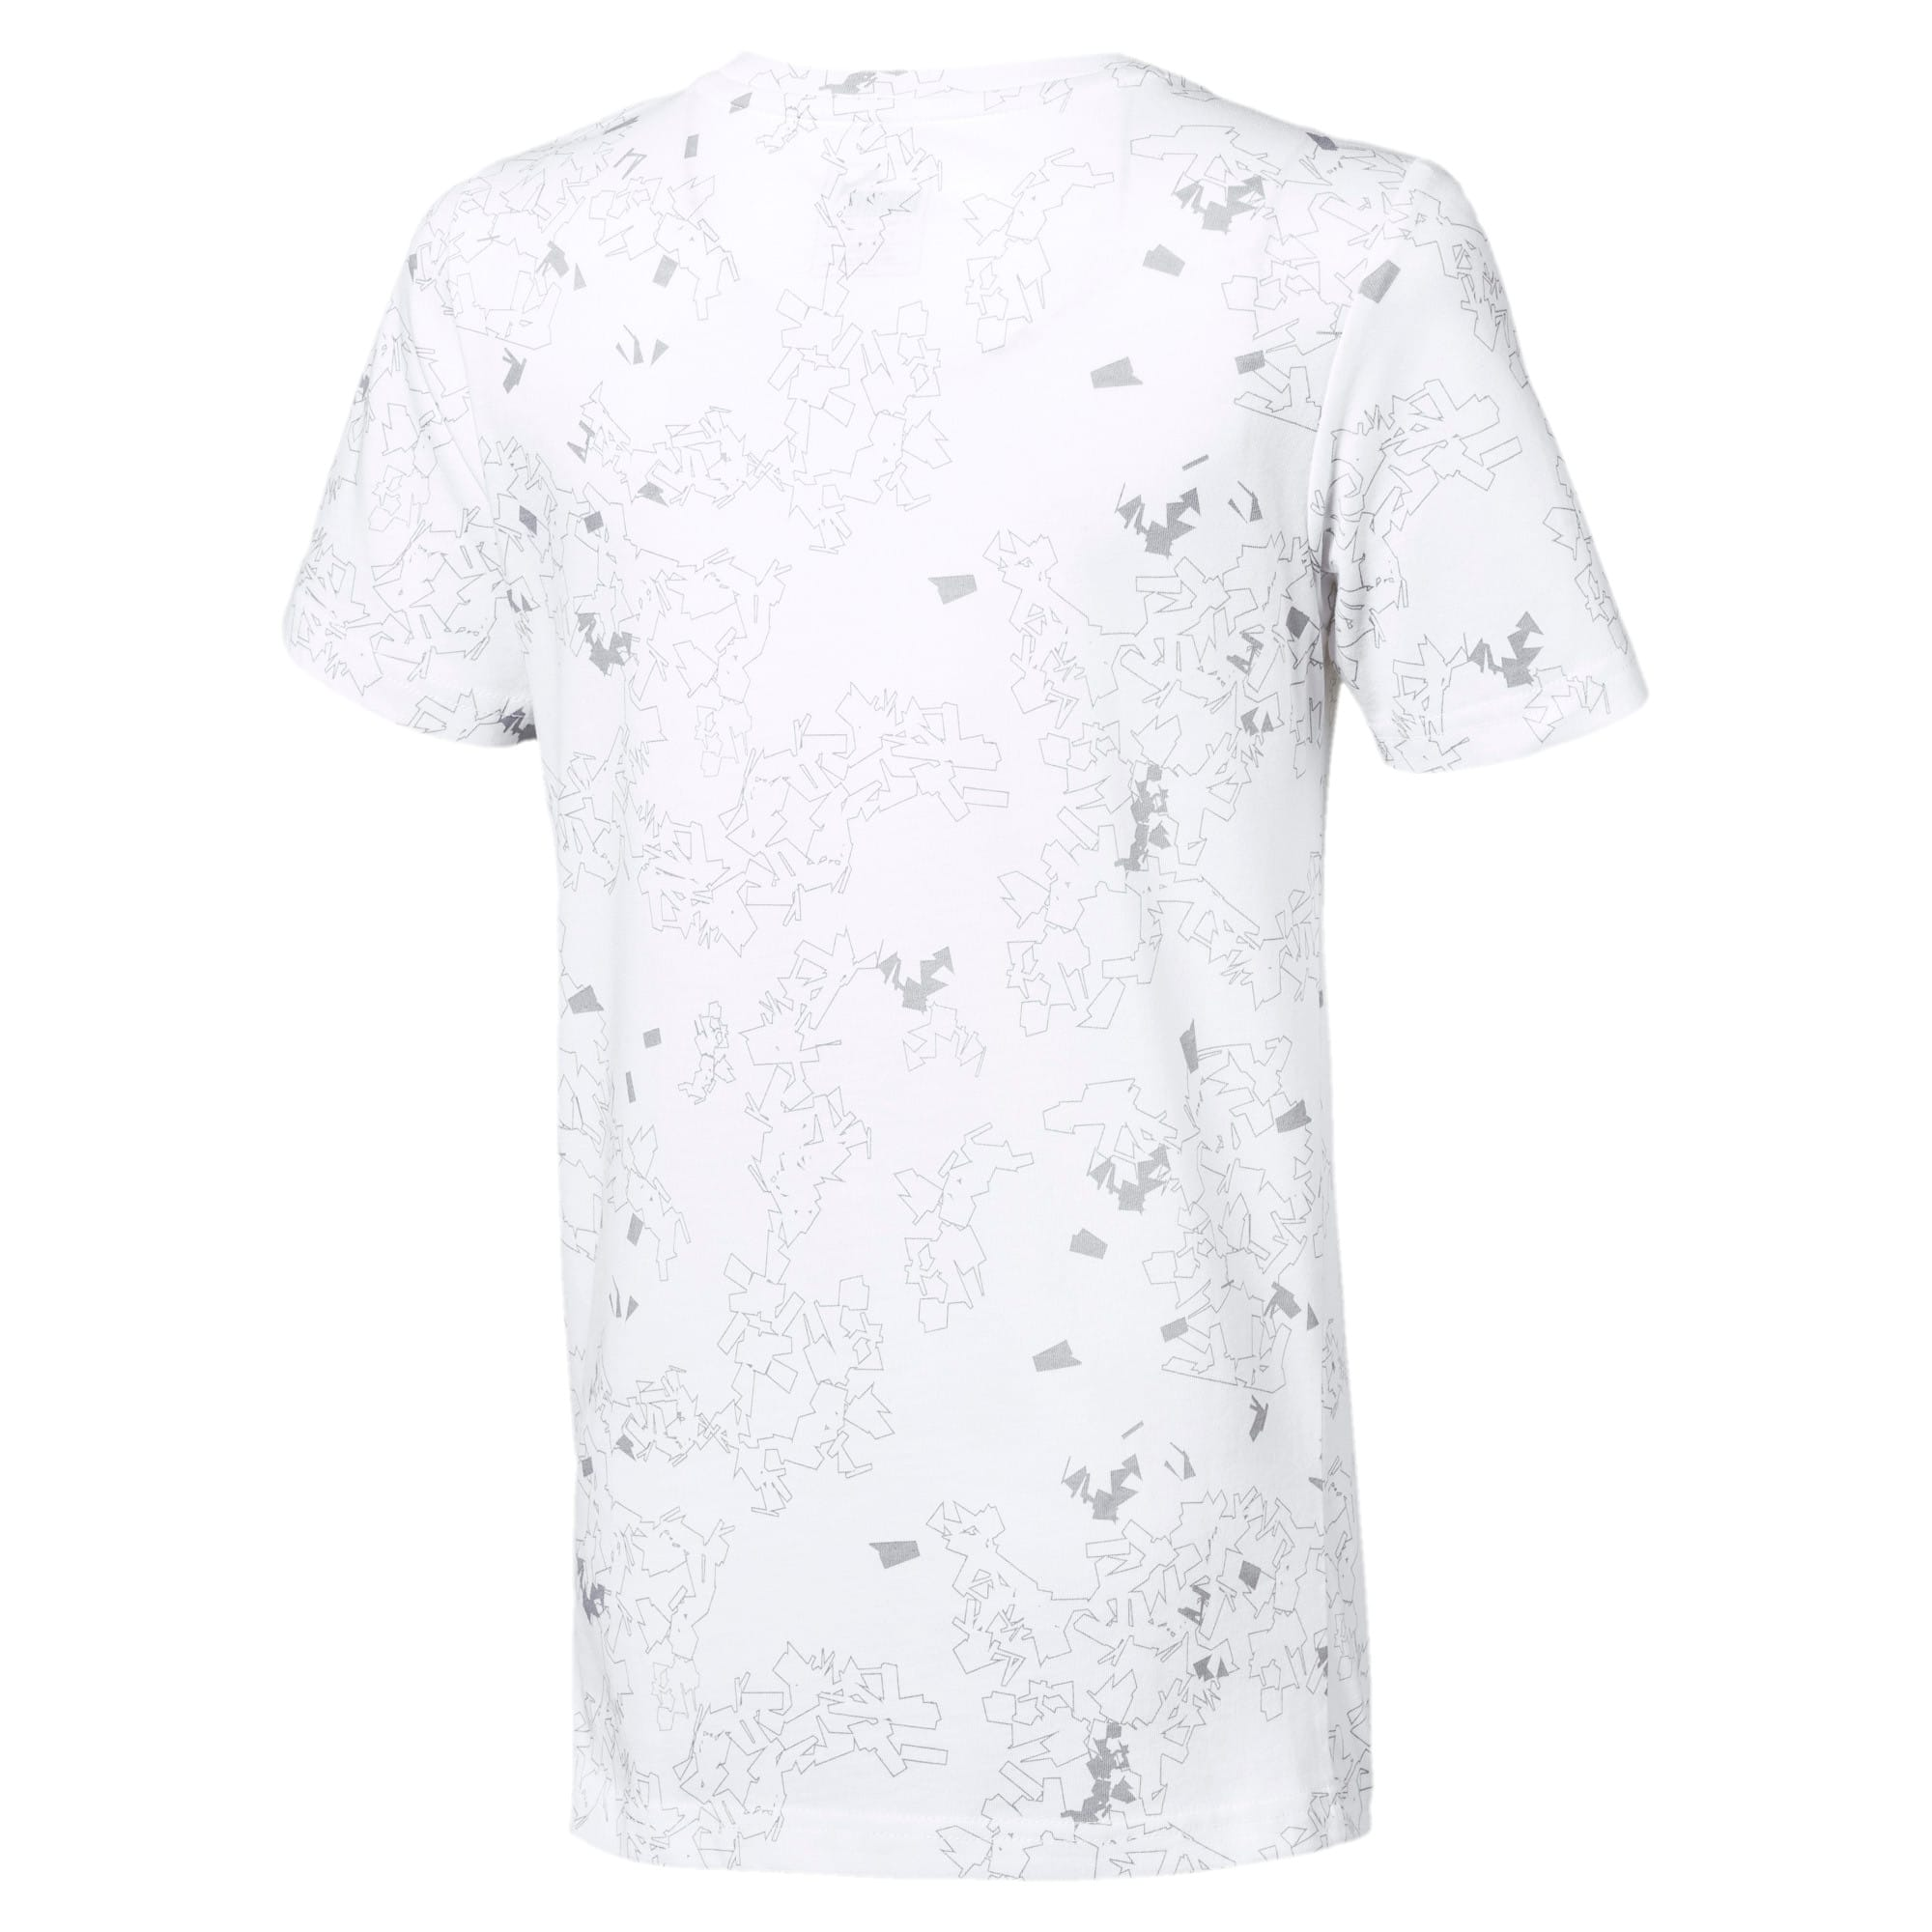 Thumbnail 2 of キッズ ACTIVE SS AOP Tシャツ 半袖, Puma White, medium-JPN